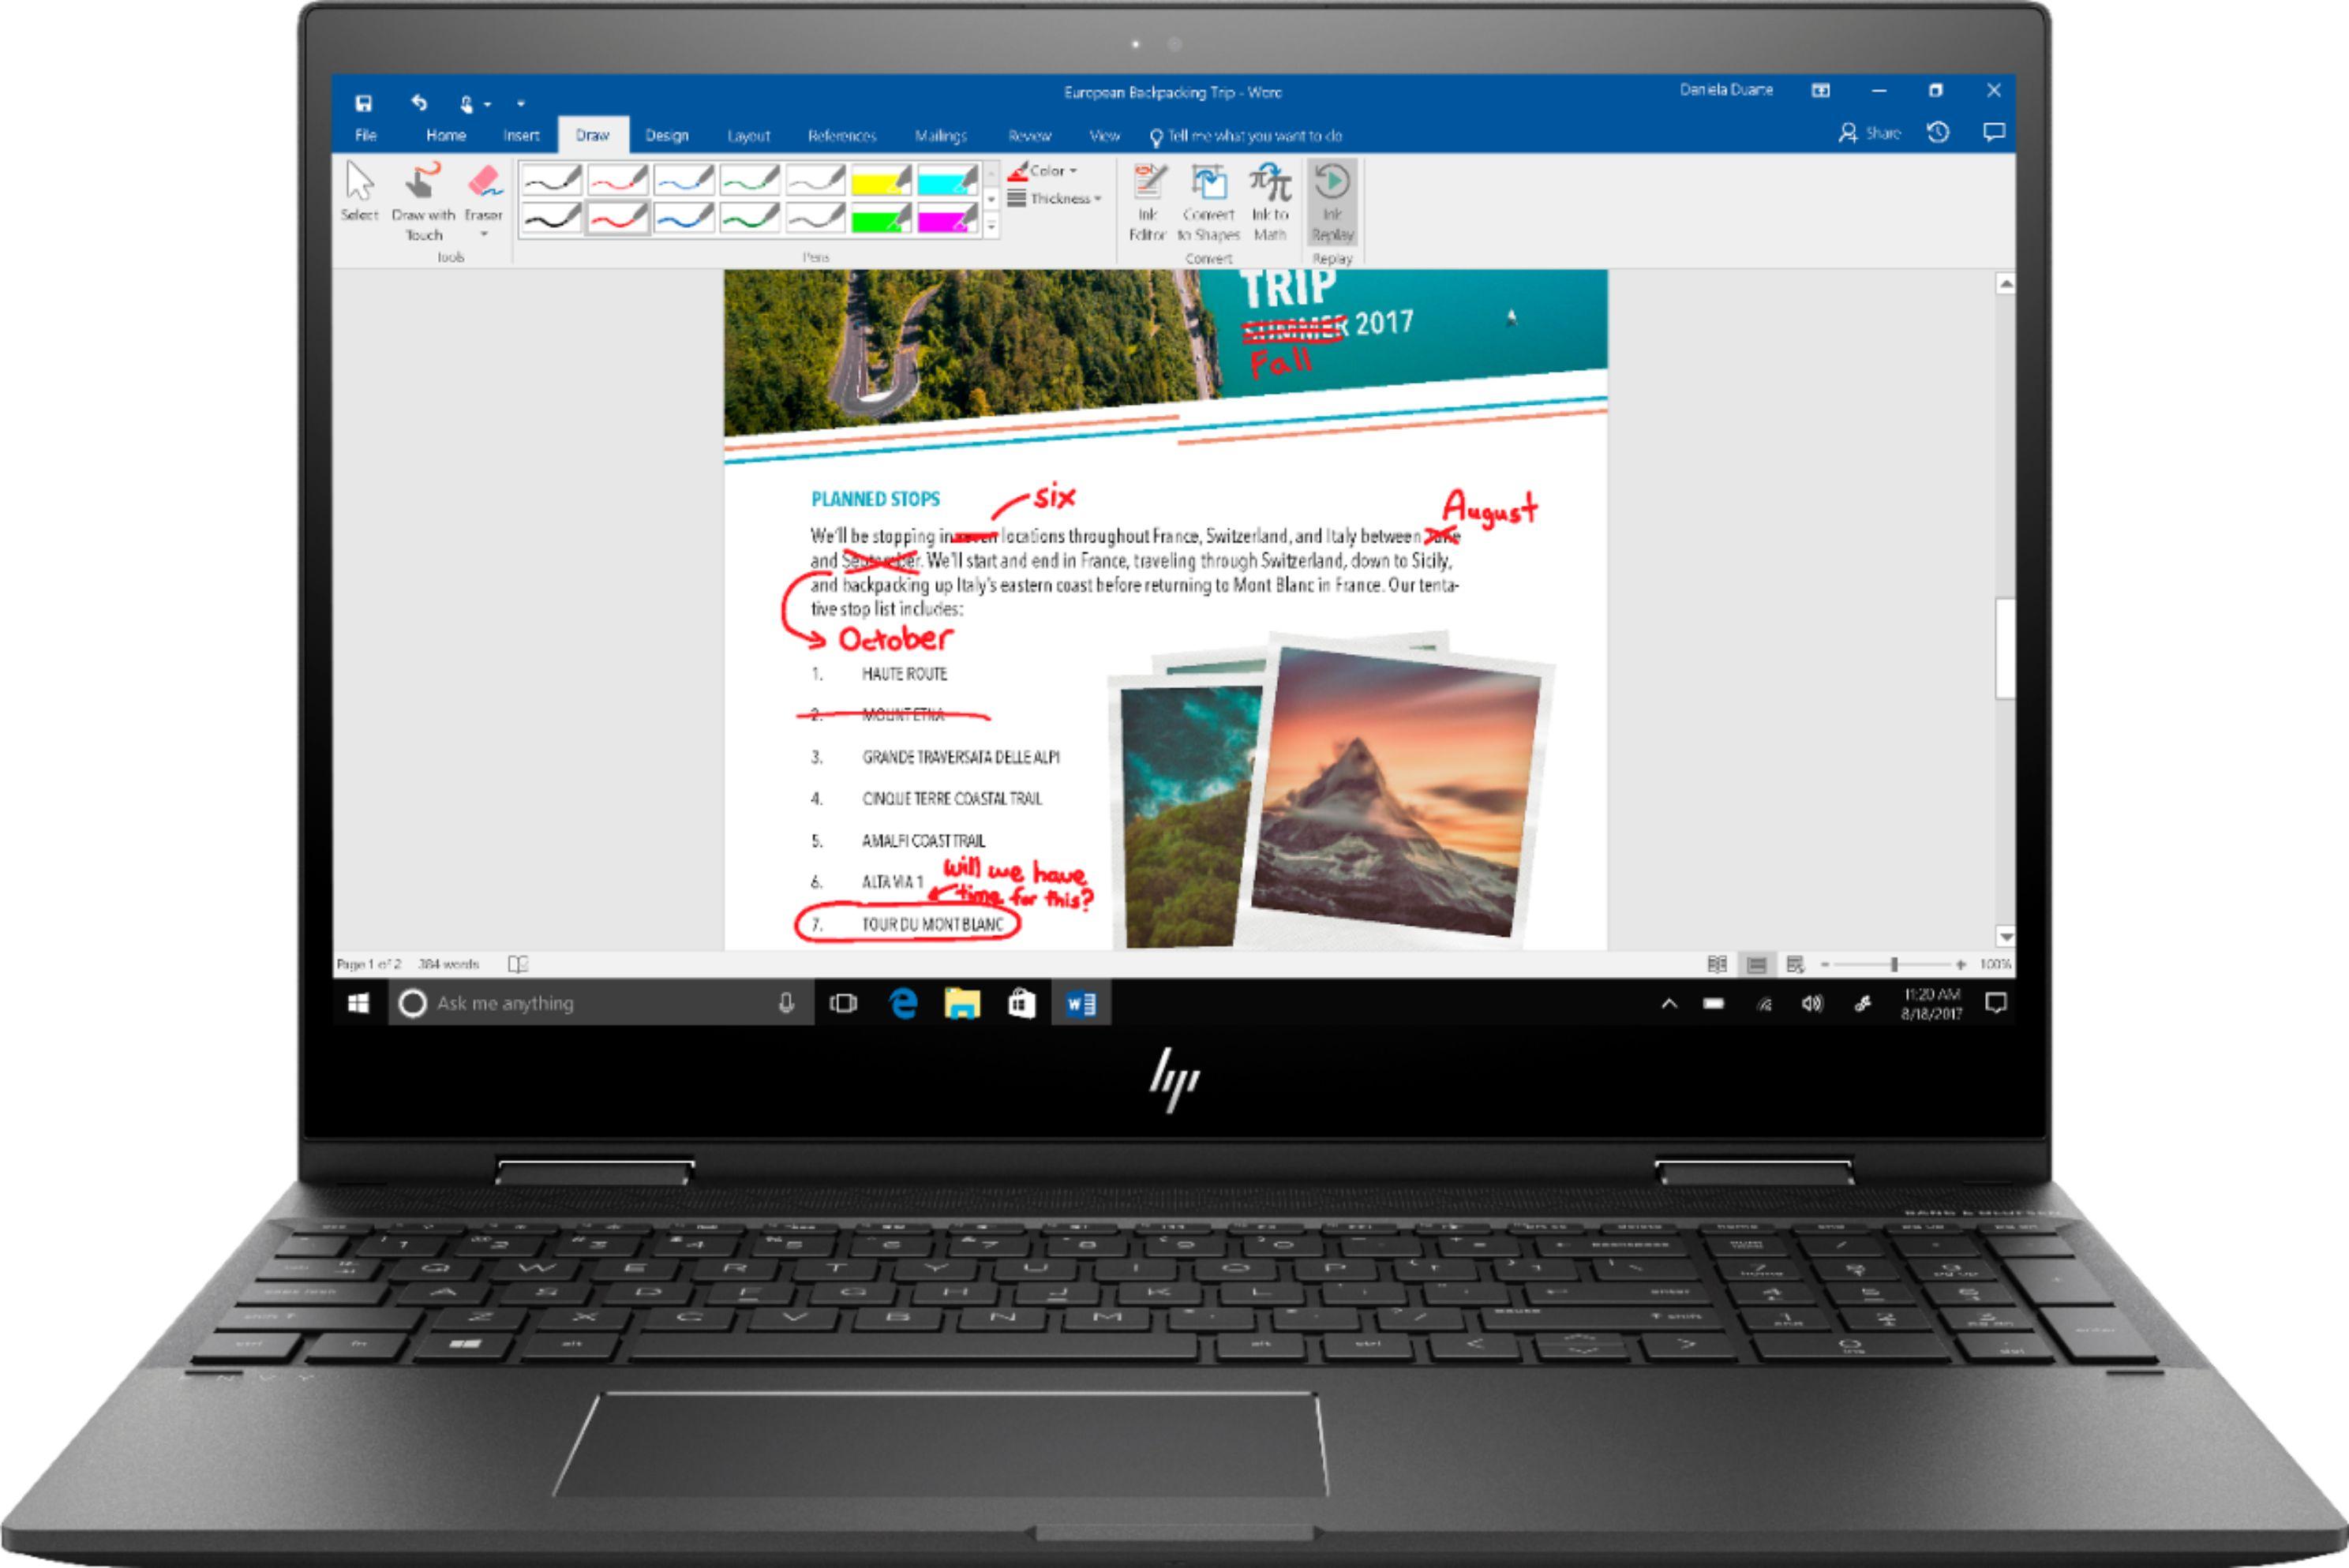 Using the Best Buy 3 in 1 laptop